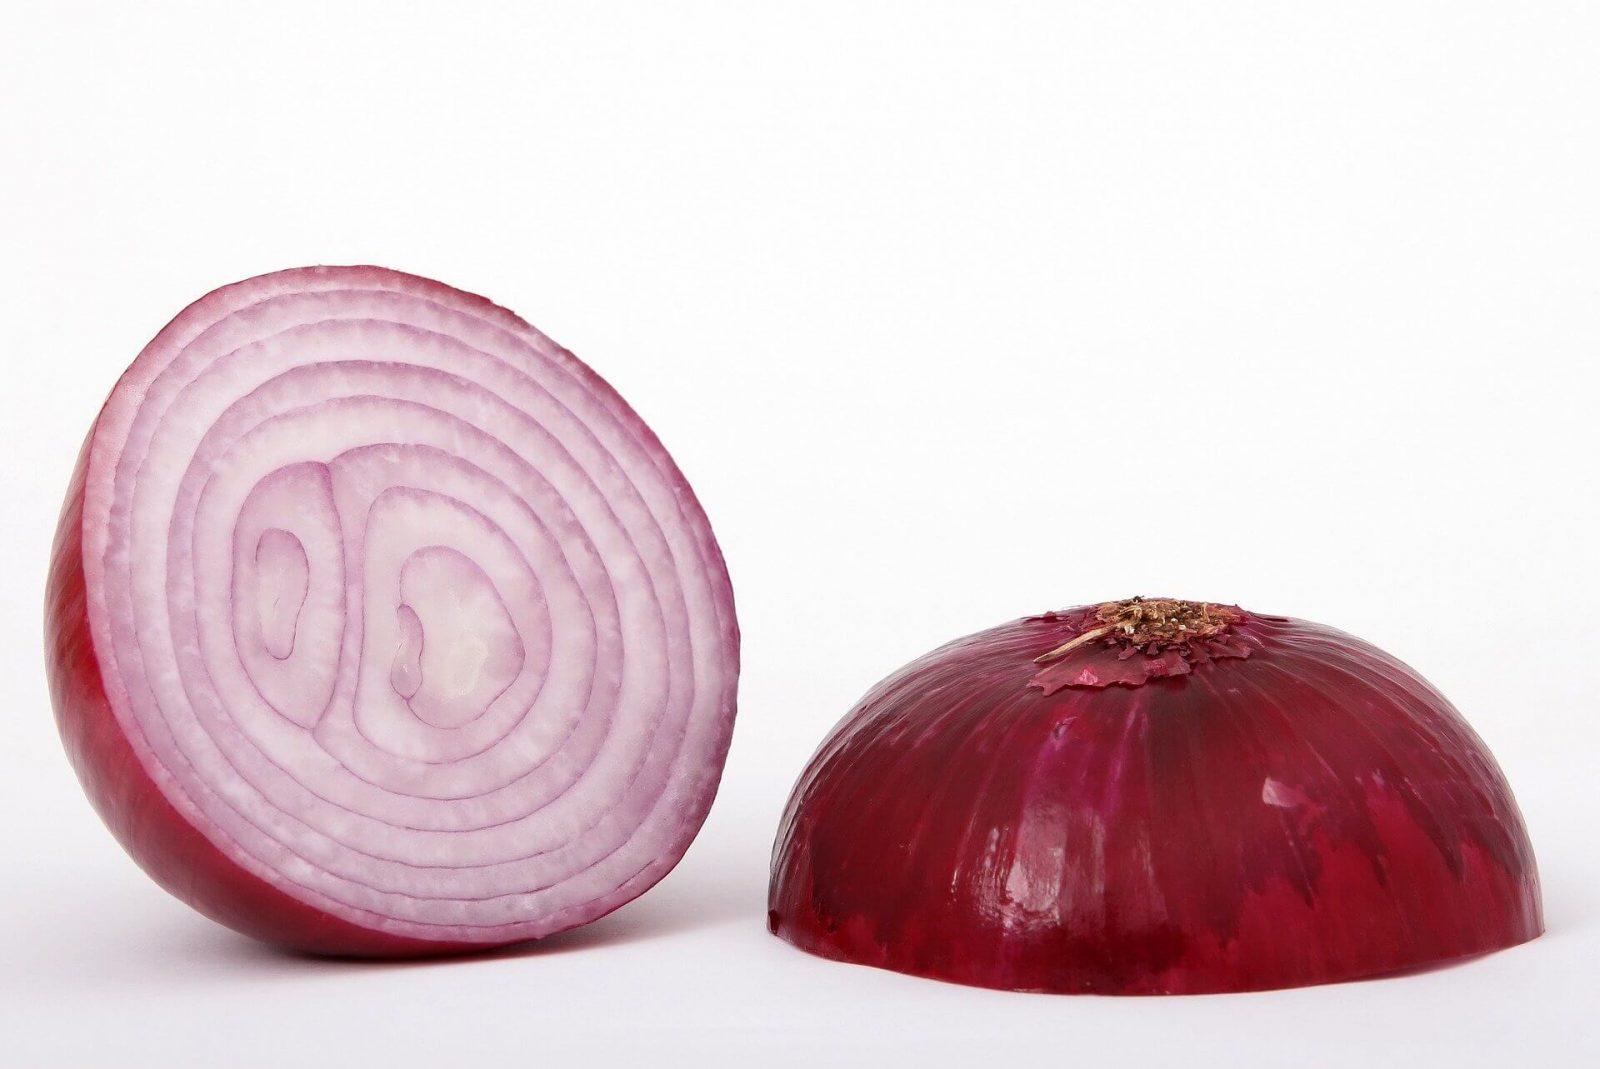 displays are like onions